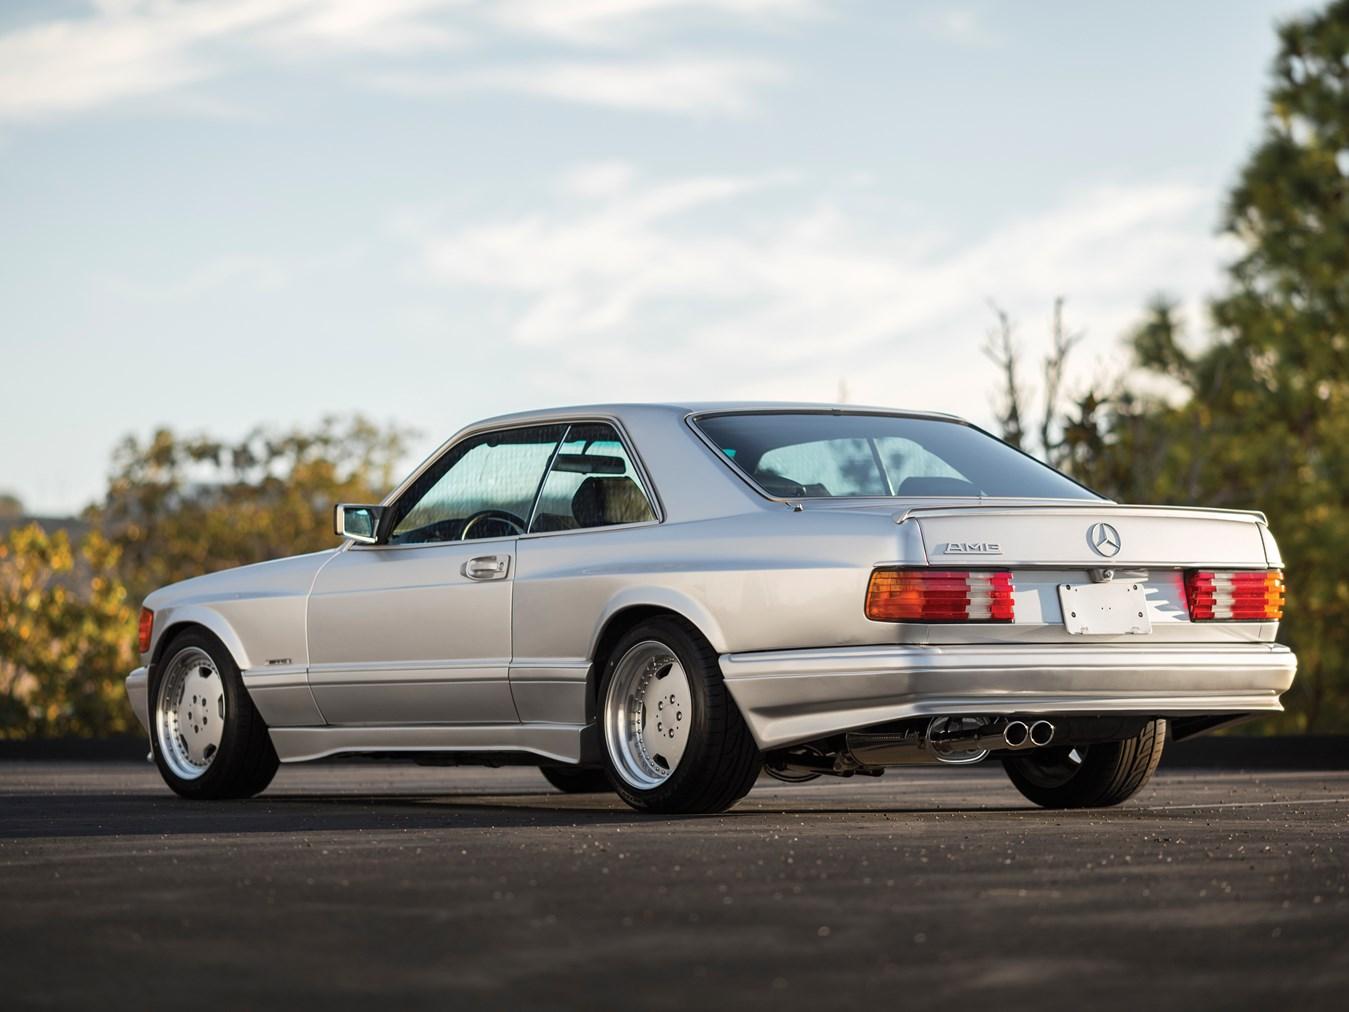 1989 Mercedes-Benz 560 SEC 6.0 AMG 'Wide Body'